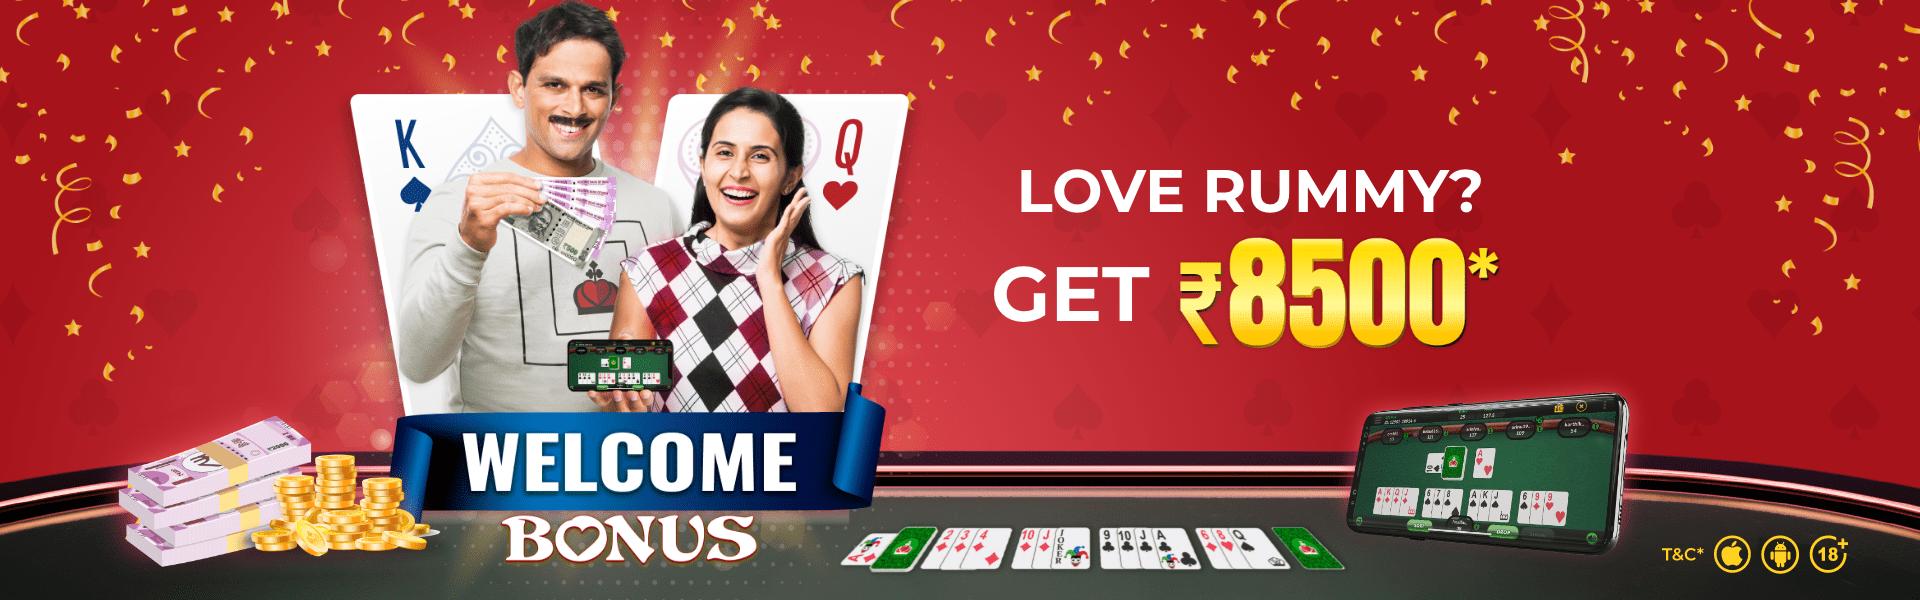 Classic Rummy Welcome Bonus